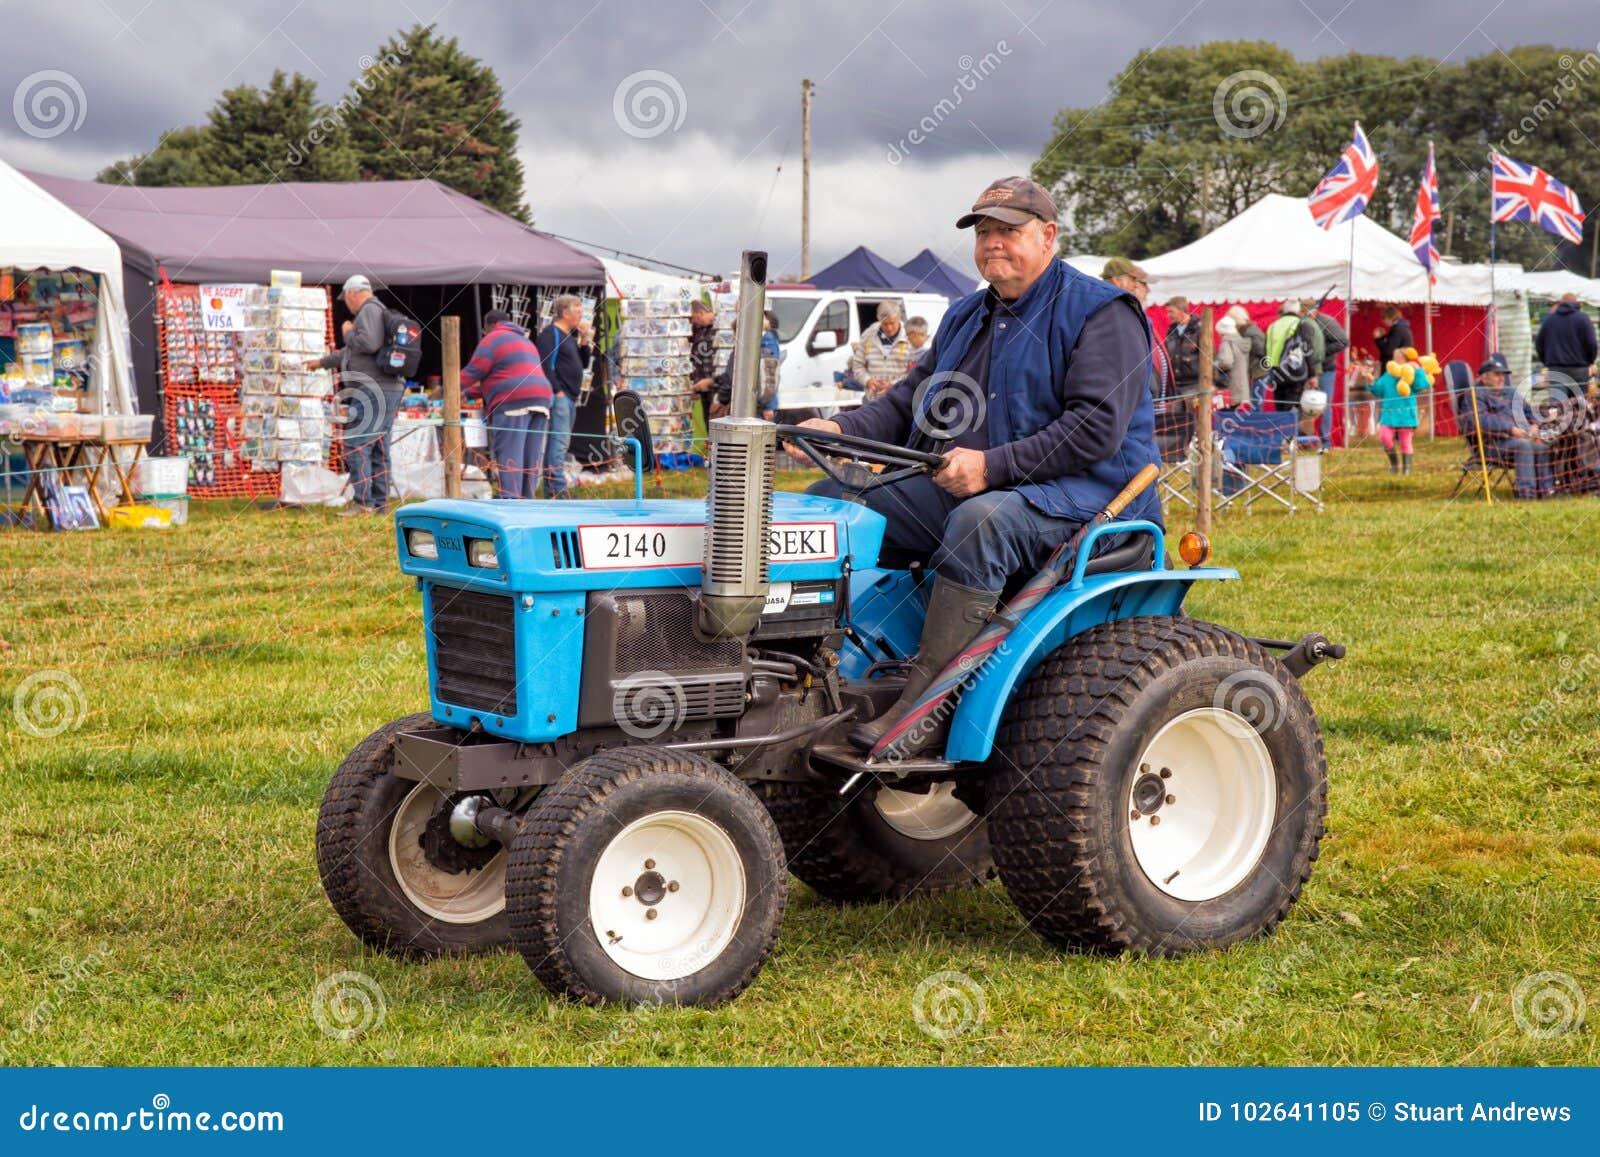 ISEKI TX2140 Compact Tractor  Editorial Image - Image of